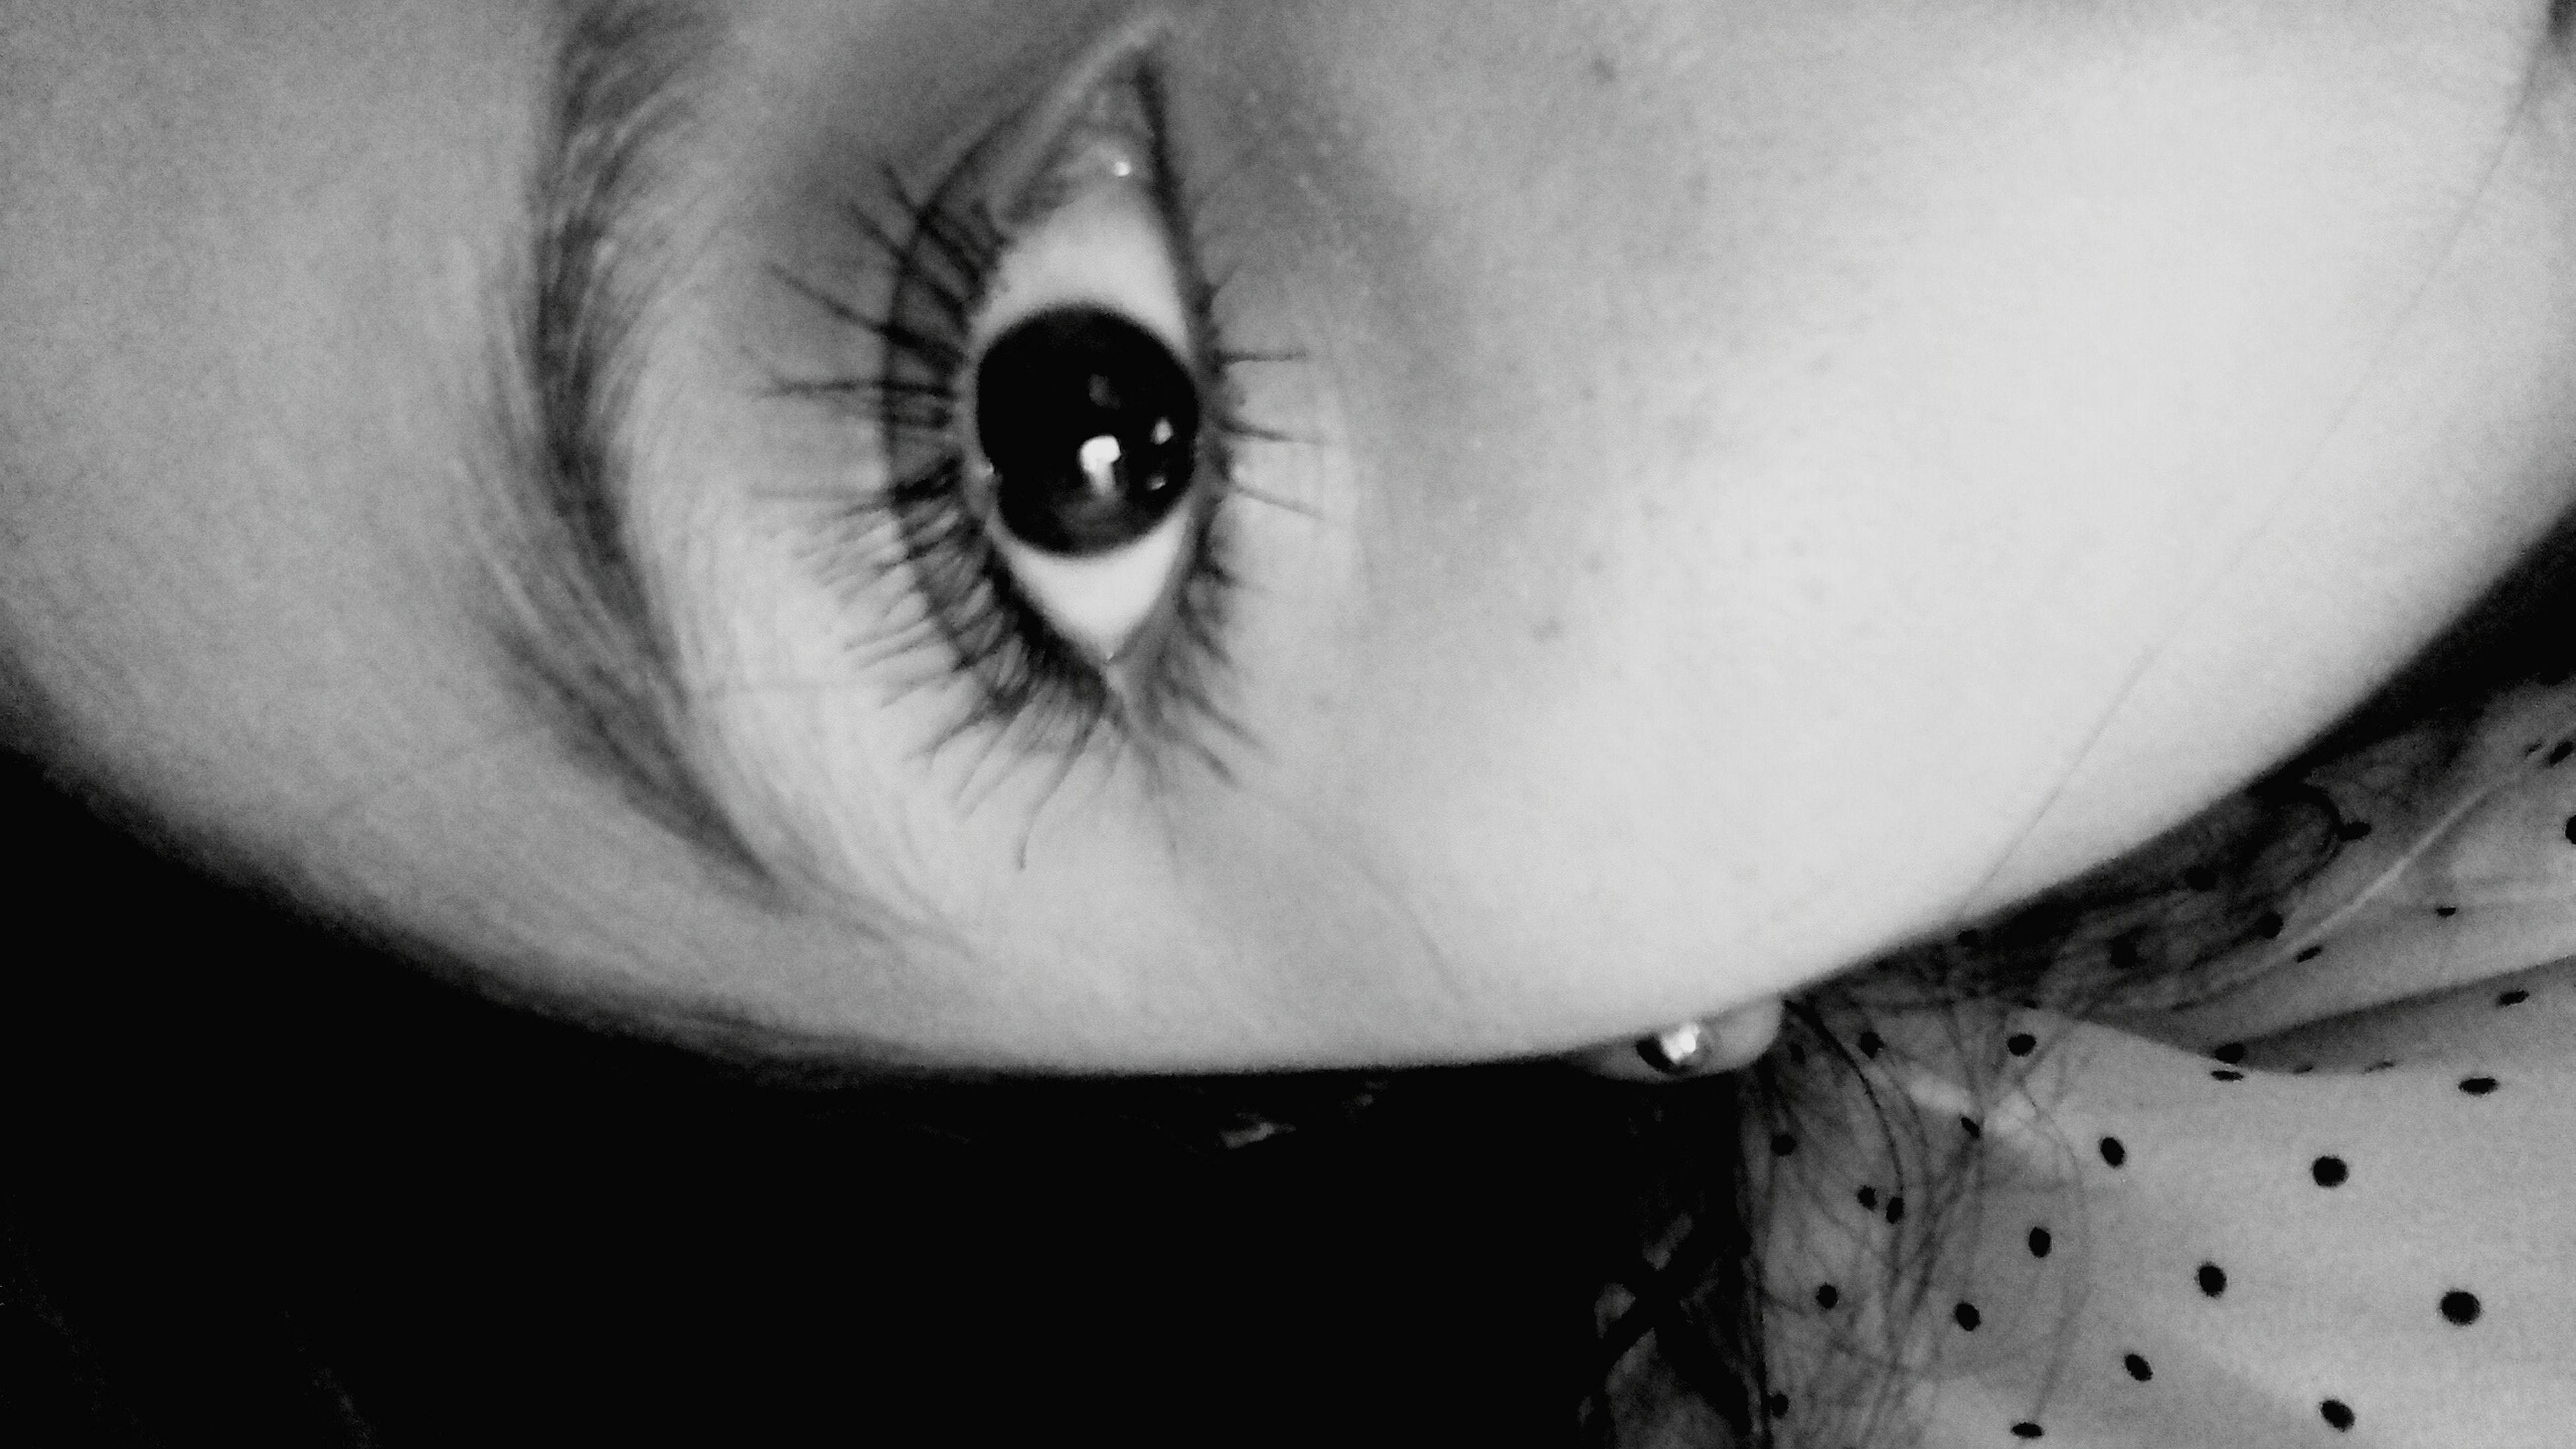 close-up, looking at camera, portrait, indoors, human eye, human face, headshot, part of, eyelash, eyesight, sensory perception, front view, extreme close-up, lifestyles, human skin, detail, animal eye